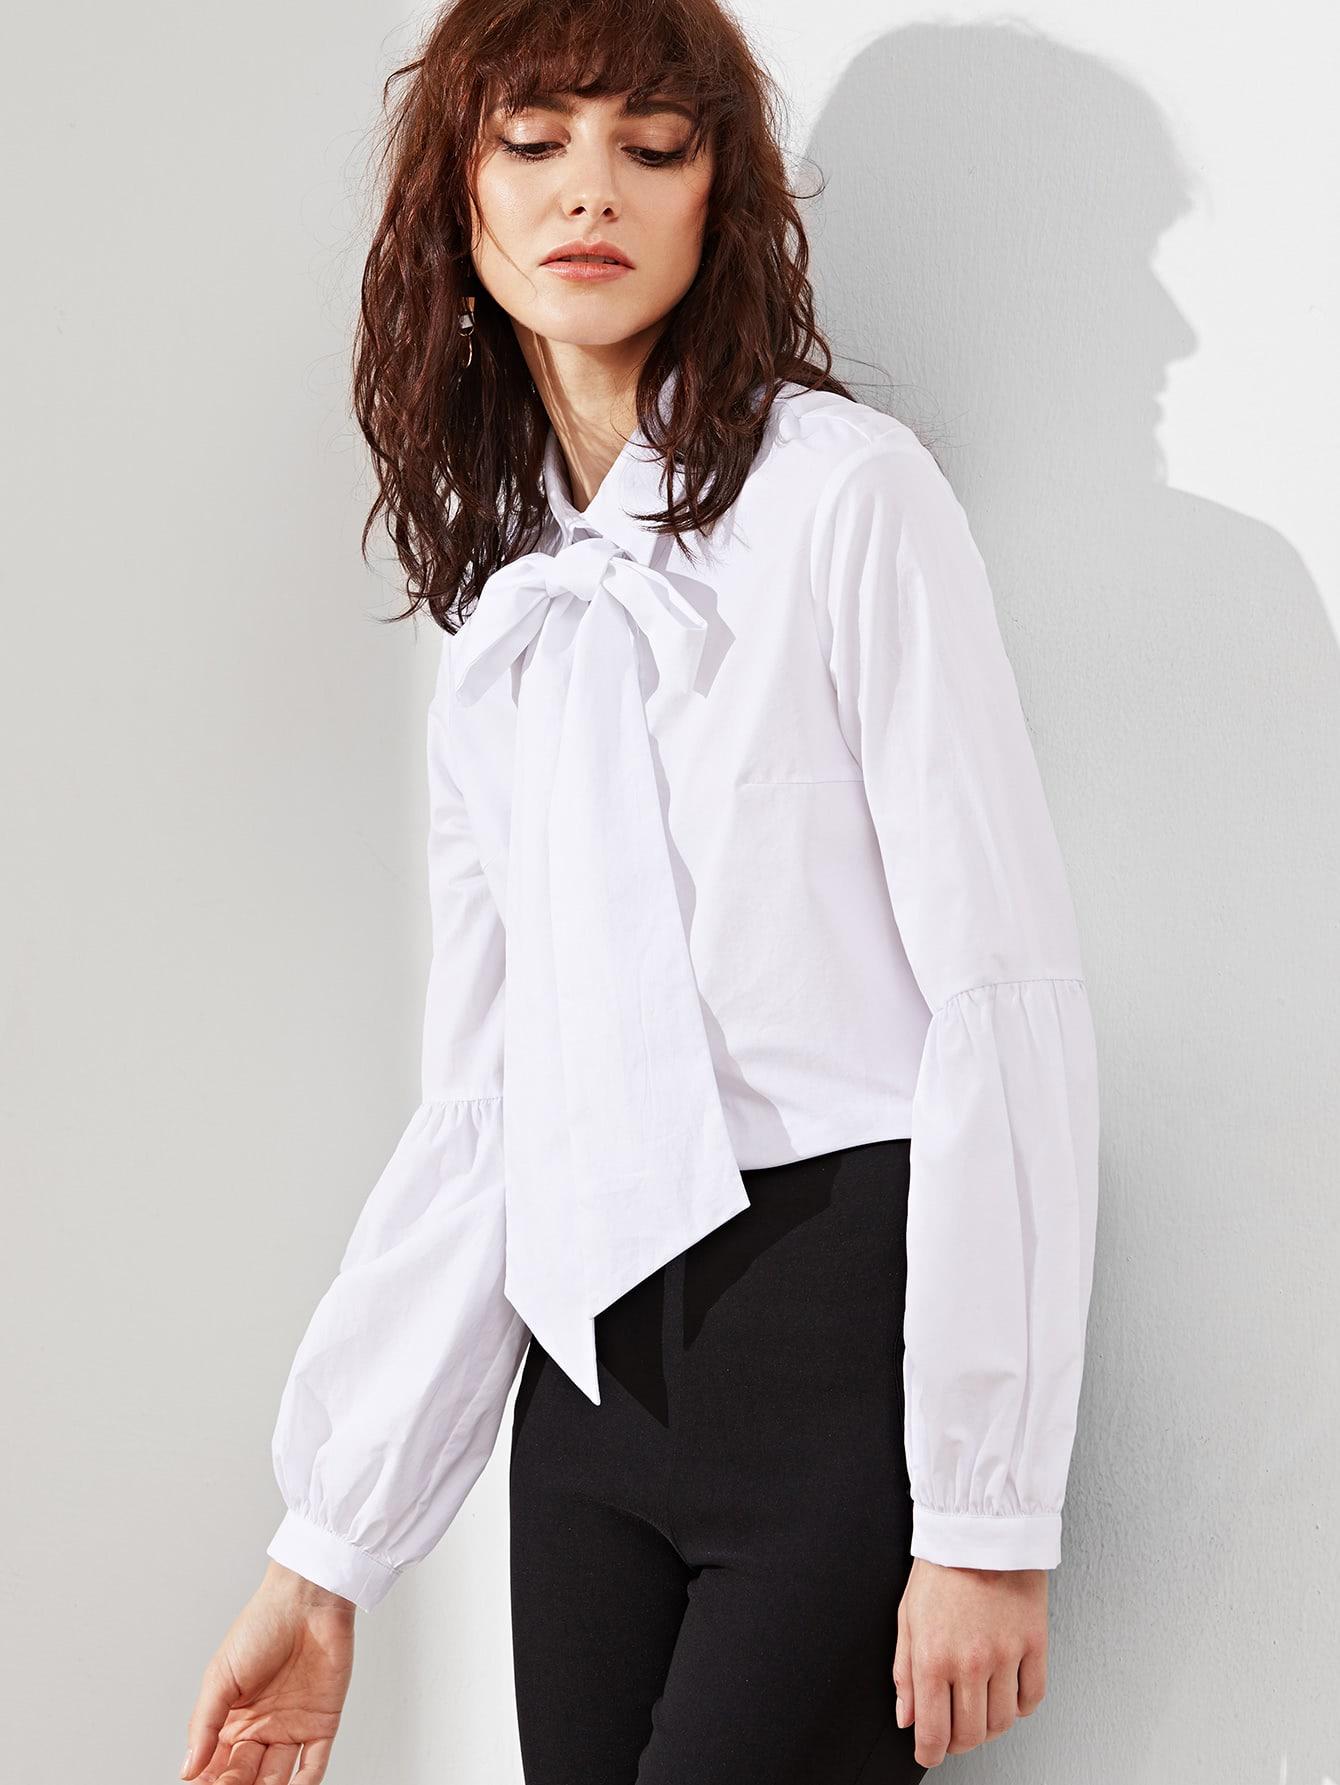 blouse161228706_2